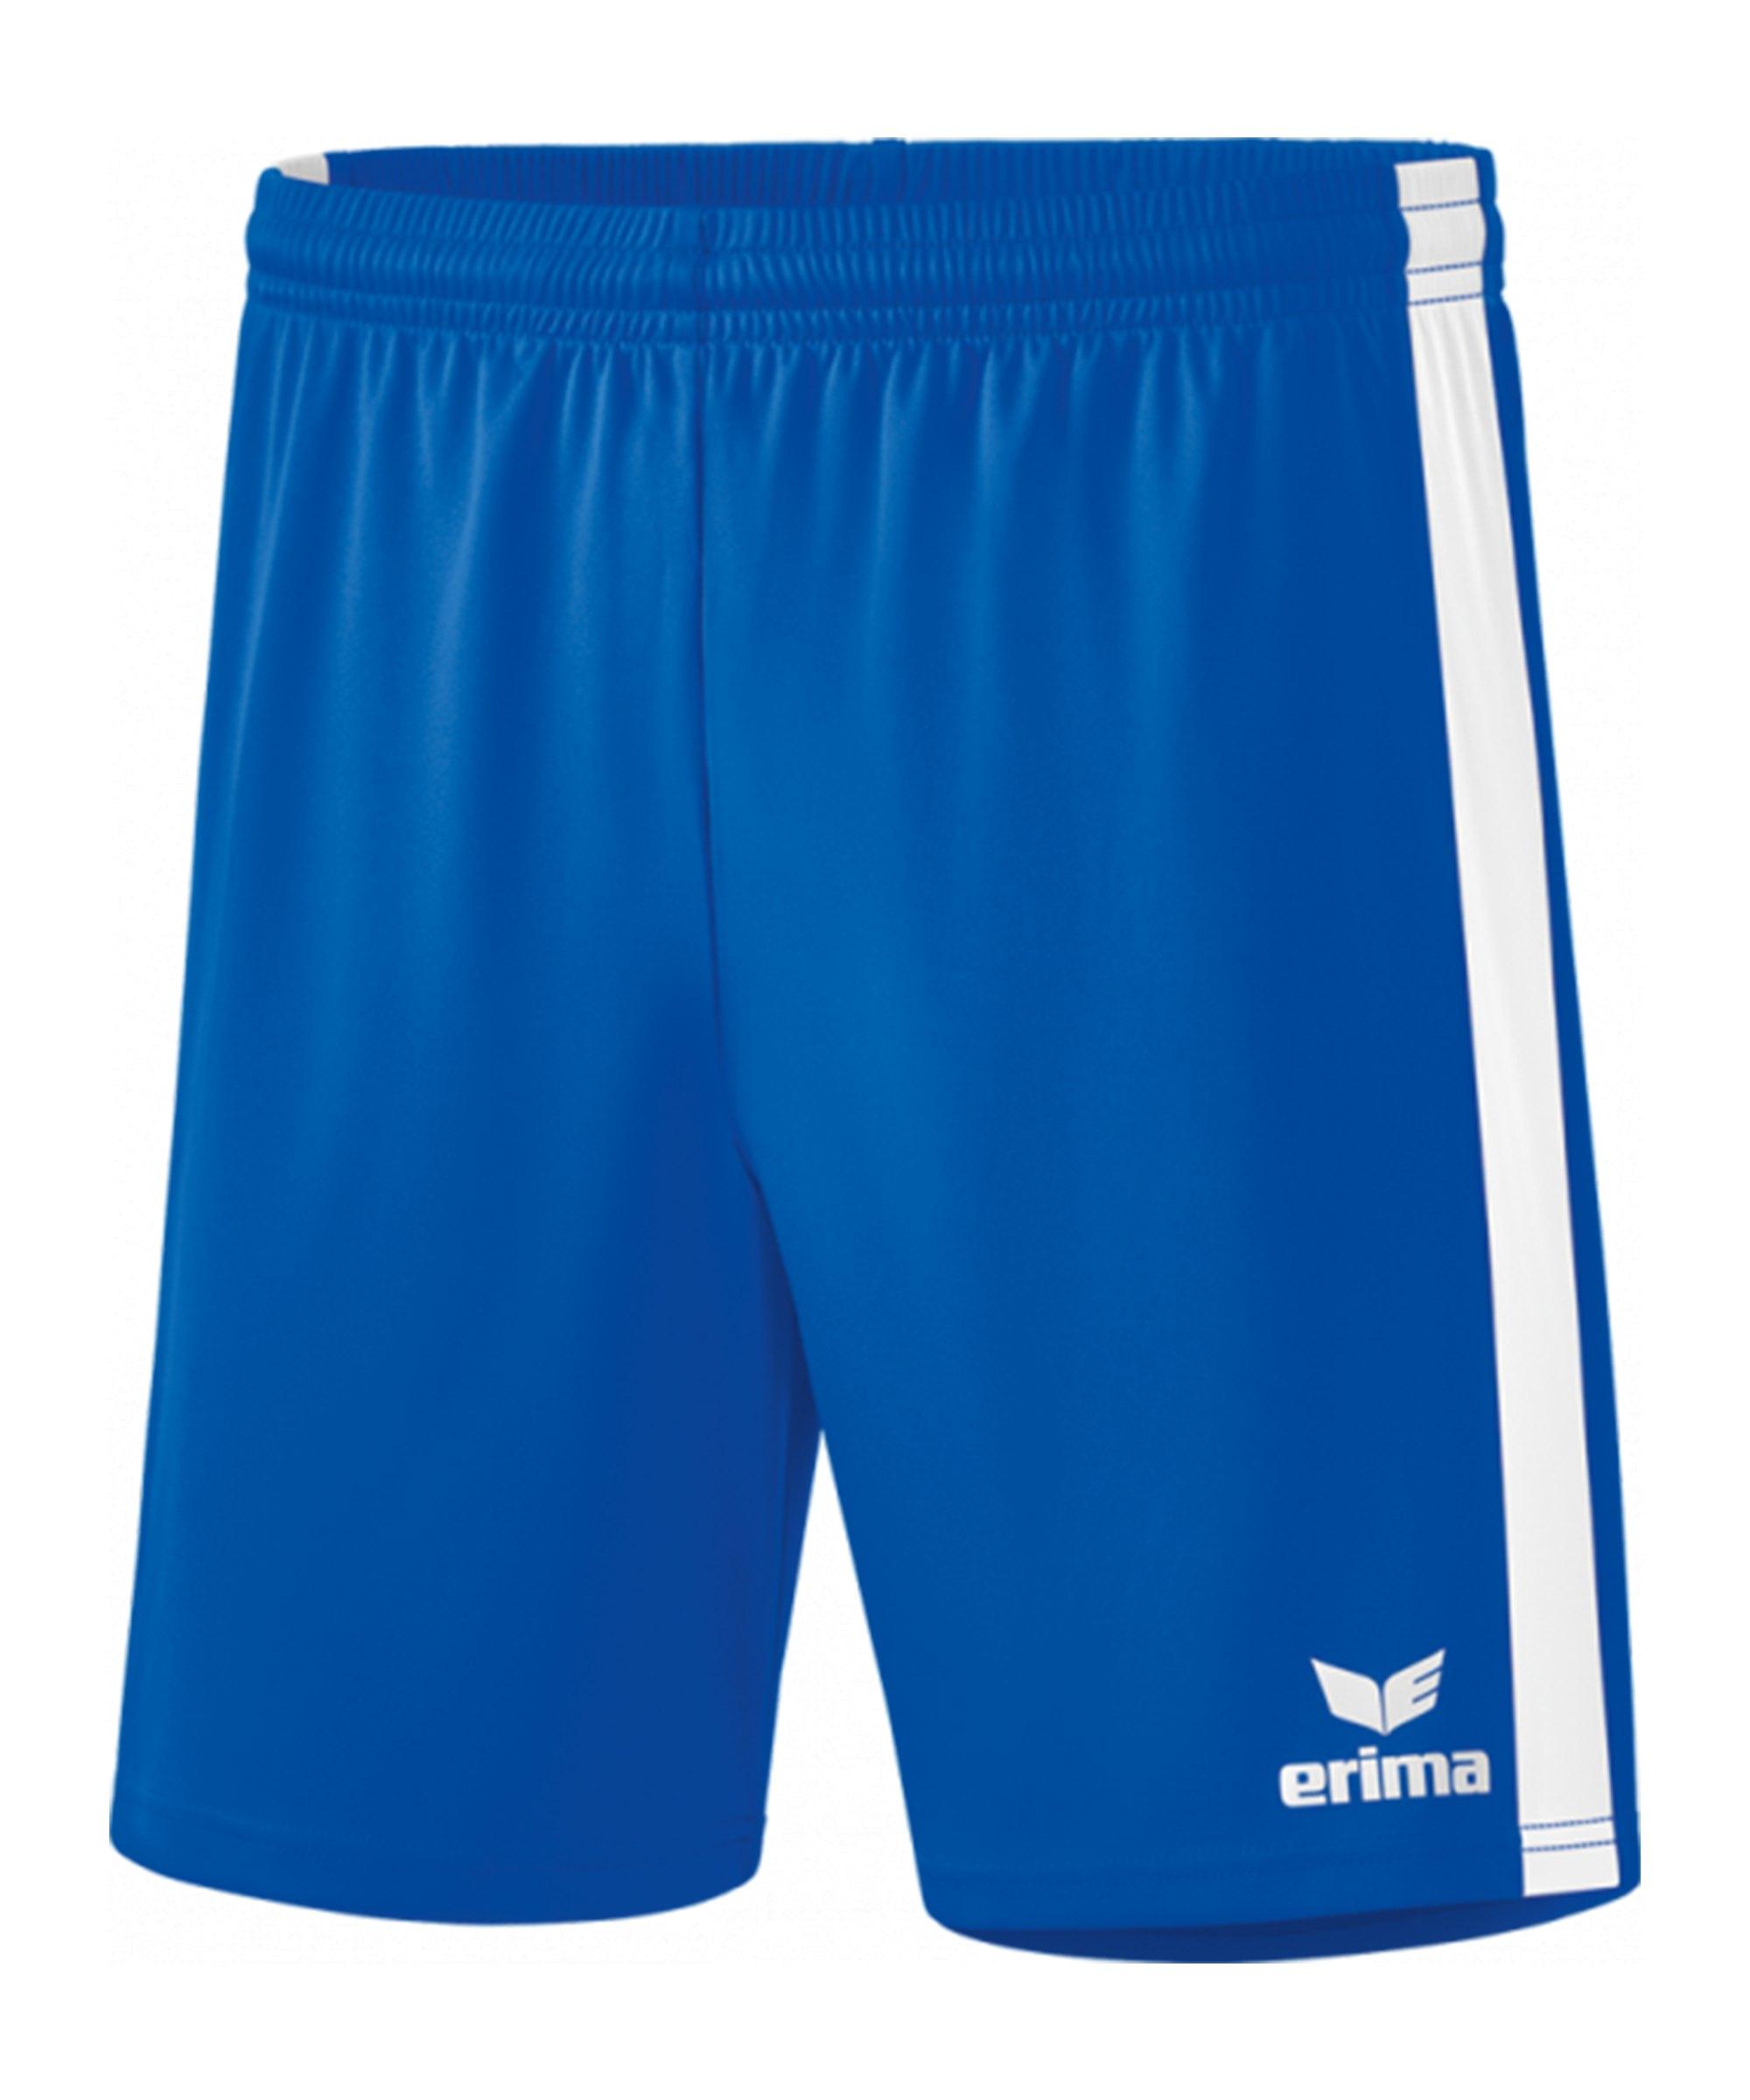 Erima Retro Star Short Kids Hellblau Weiss - blau